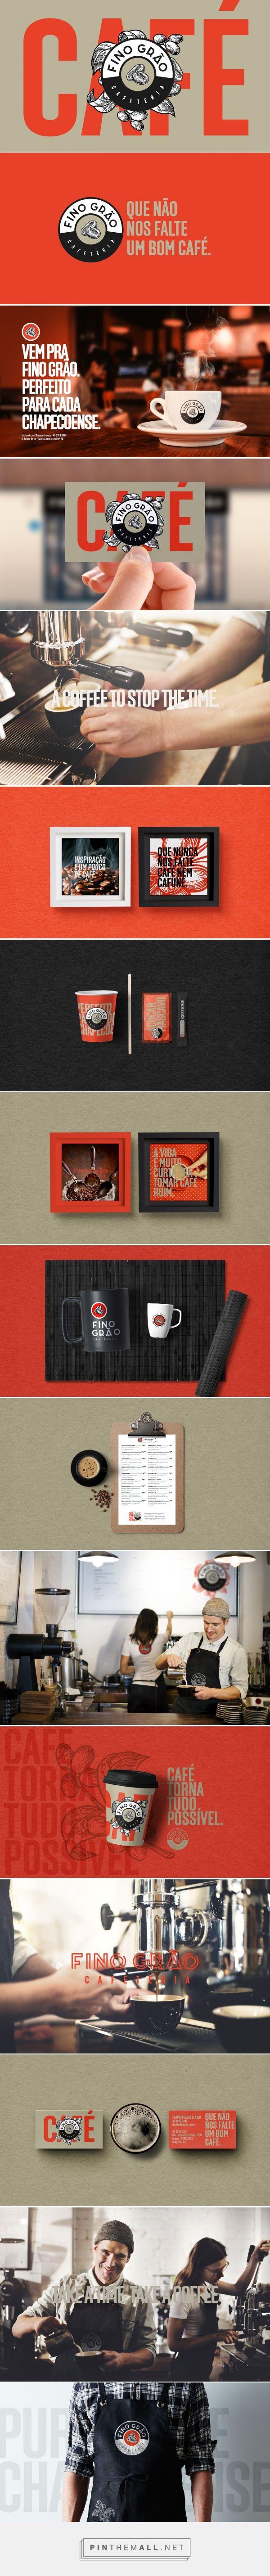 Fino Grão Cafe Branding by Triocom Graphic Design | Fivestar Branding Agency – Design and Branding Agency & Curated Inspiration Gallery